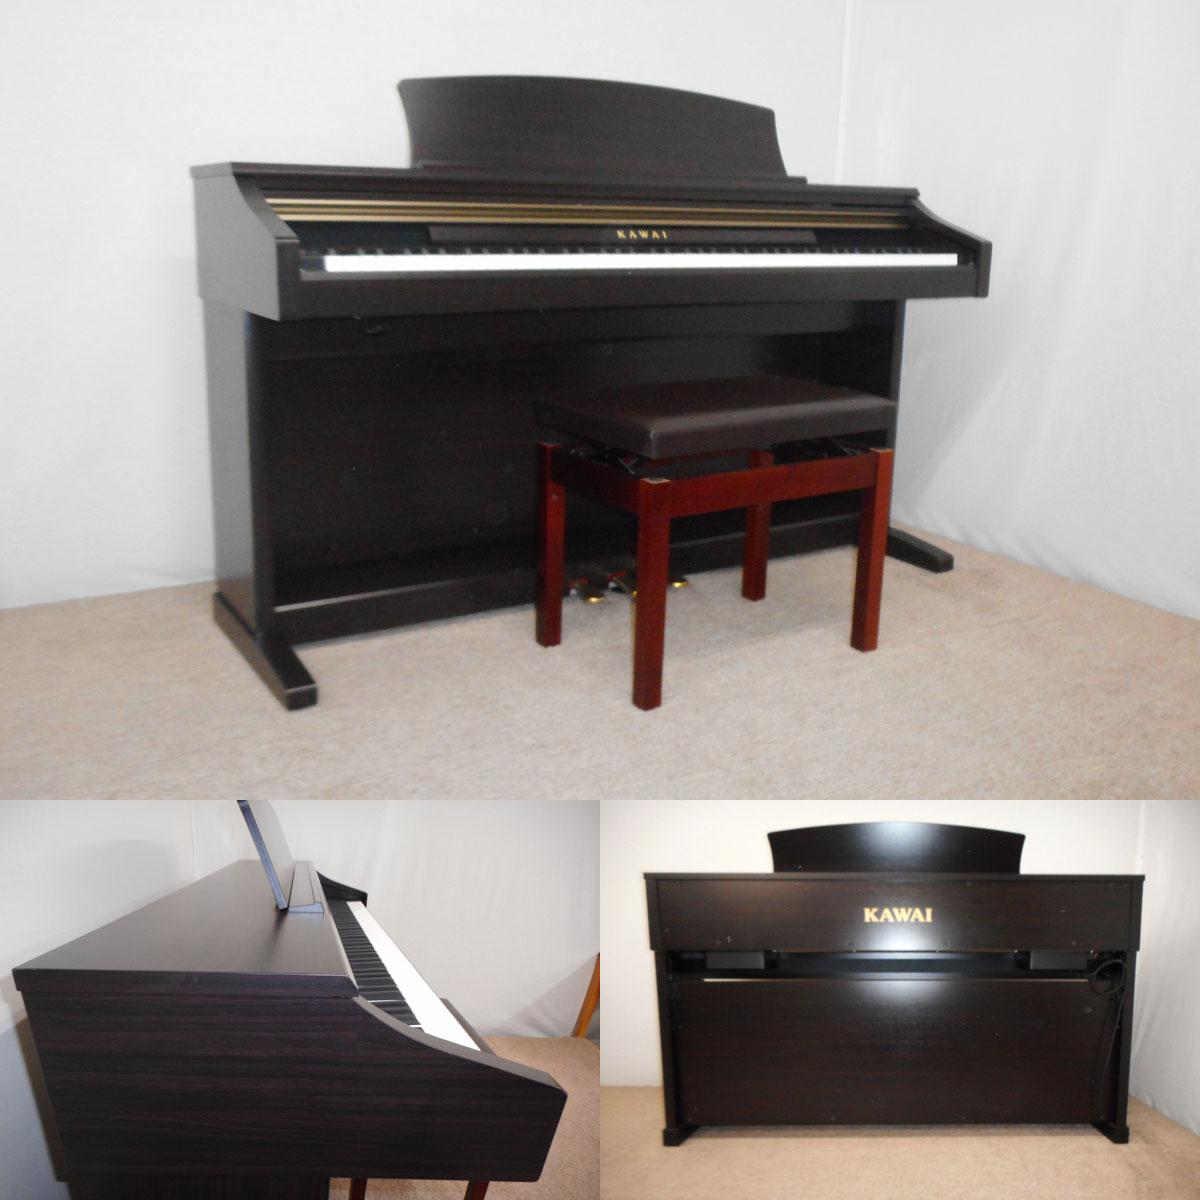 【113405】KAWAI 09年 電子ピアノ CA12R 木製鍵盤